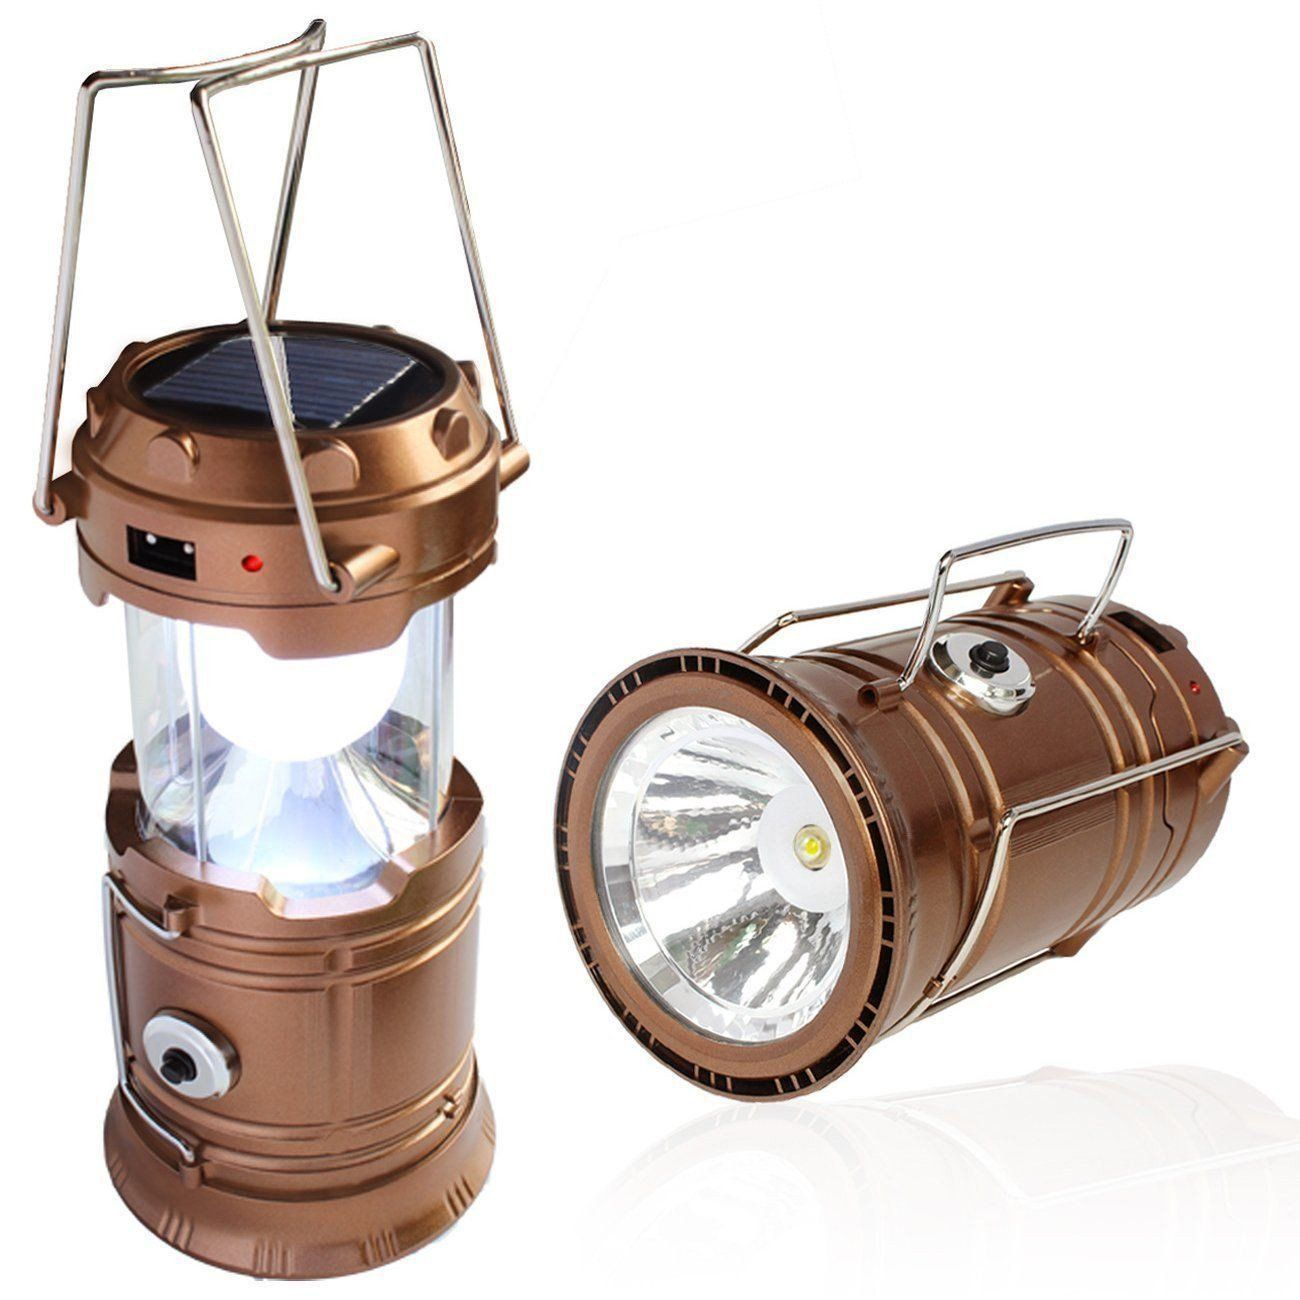 Solar Powered Camping Lantern Solar Led Camp Light Handheld Flashlight Led Camping Lantern Camping Lanterns Camping Lamp